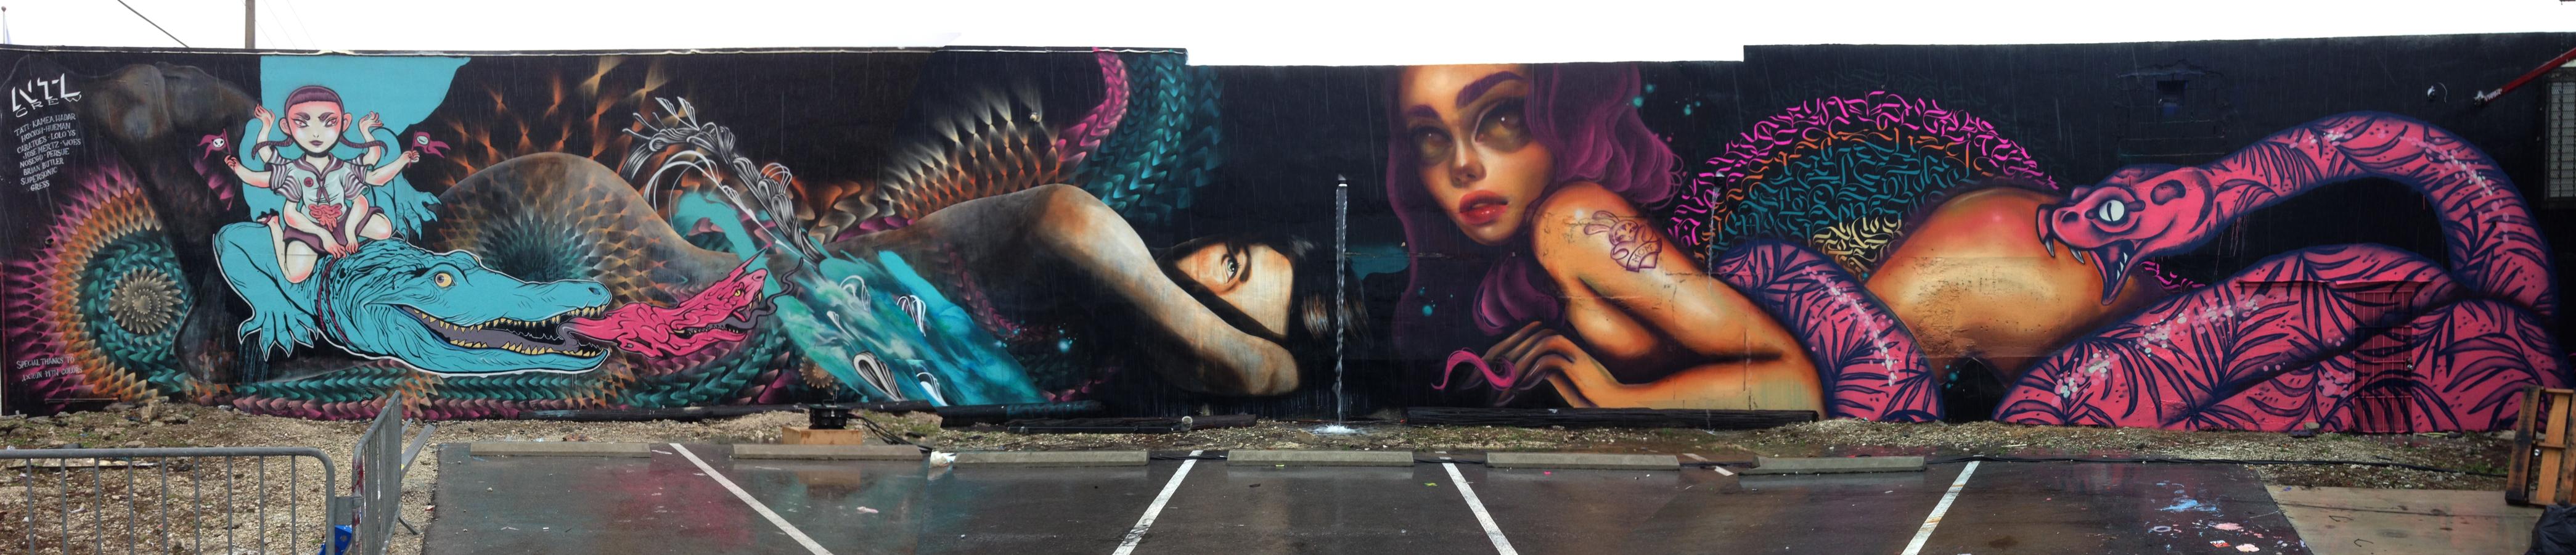 brianbutler_NTL_mural_sm